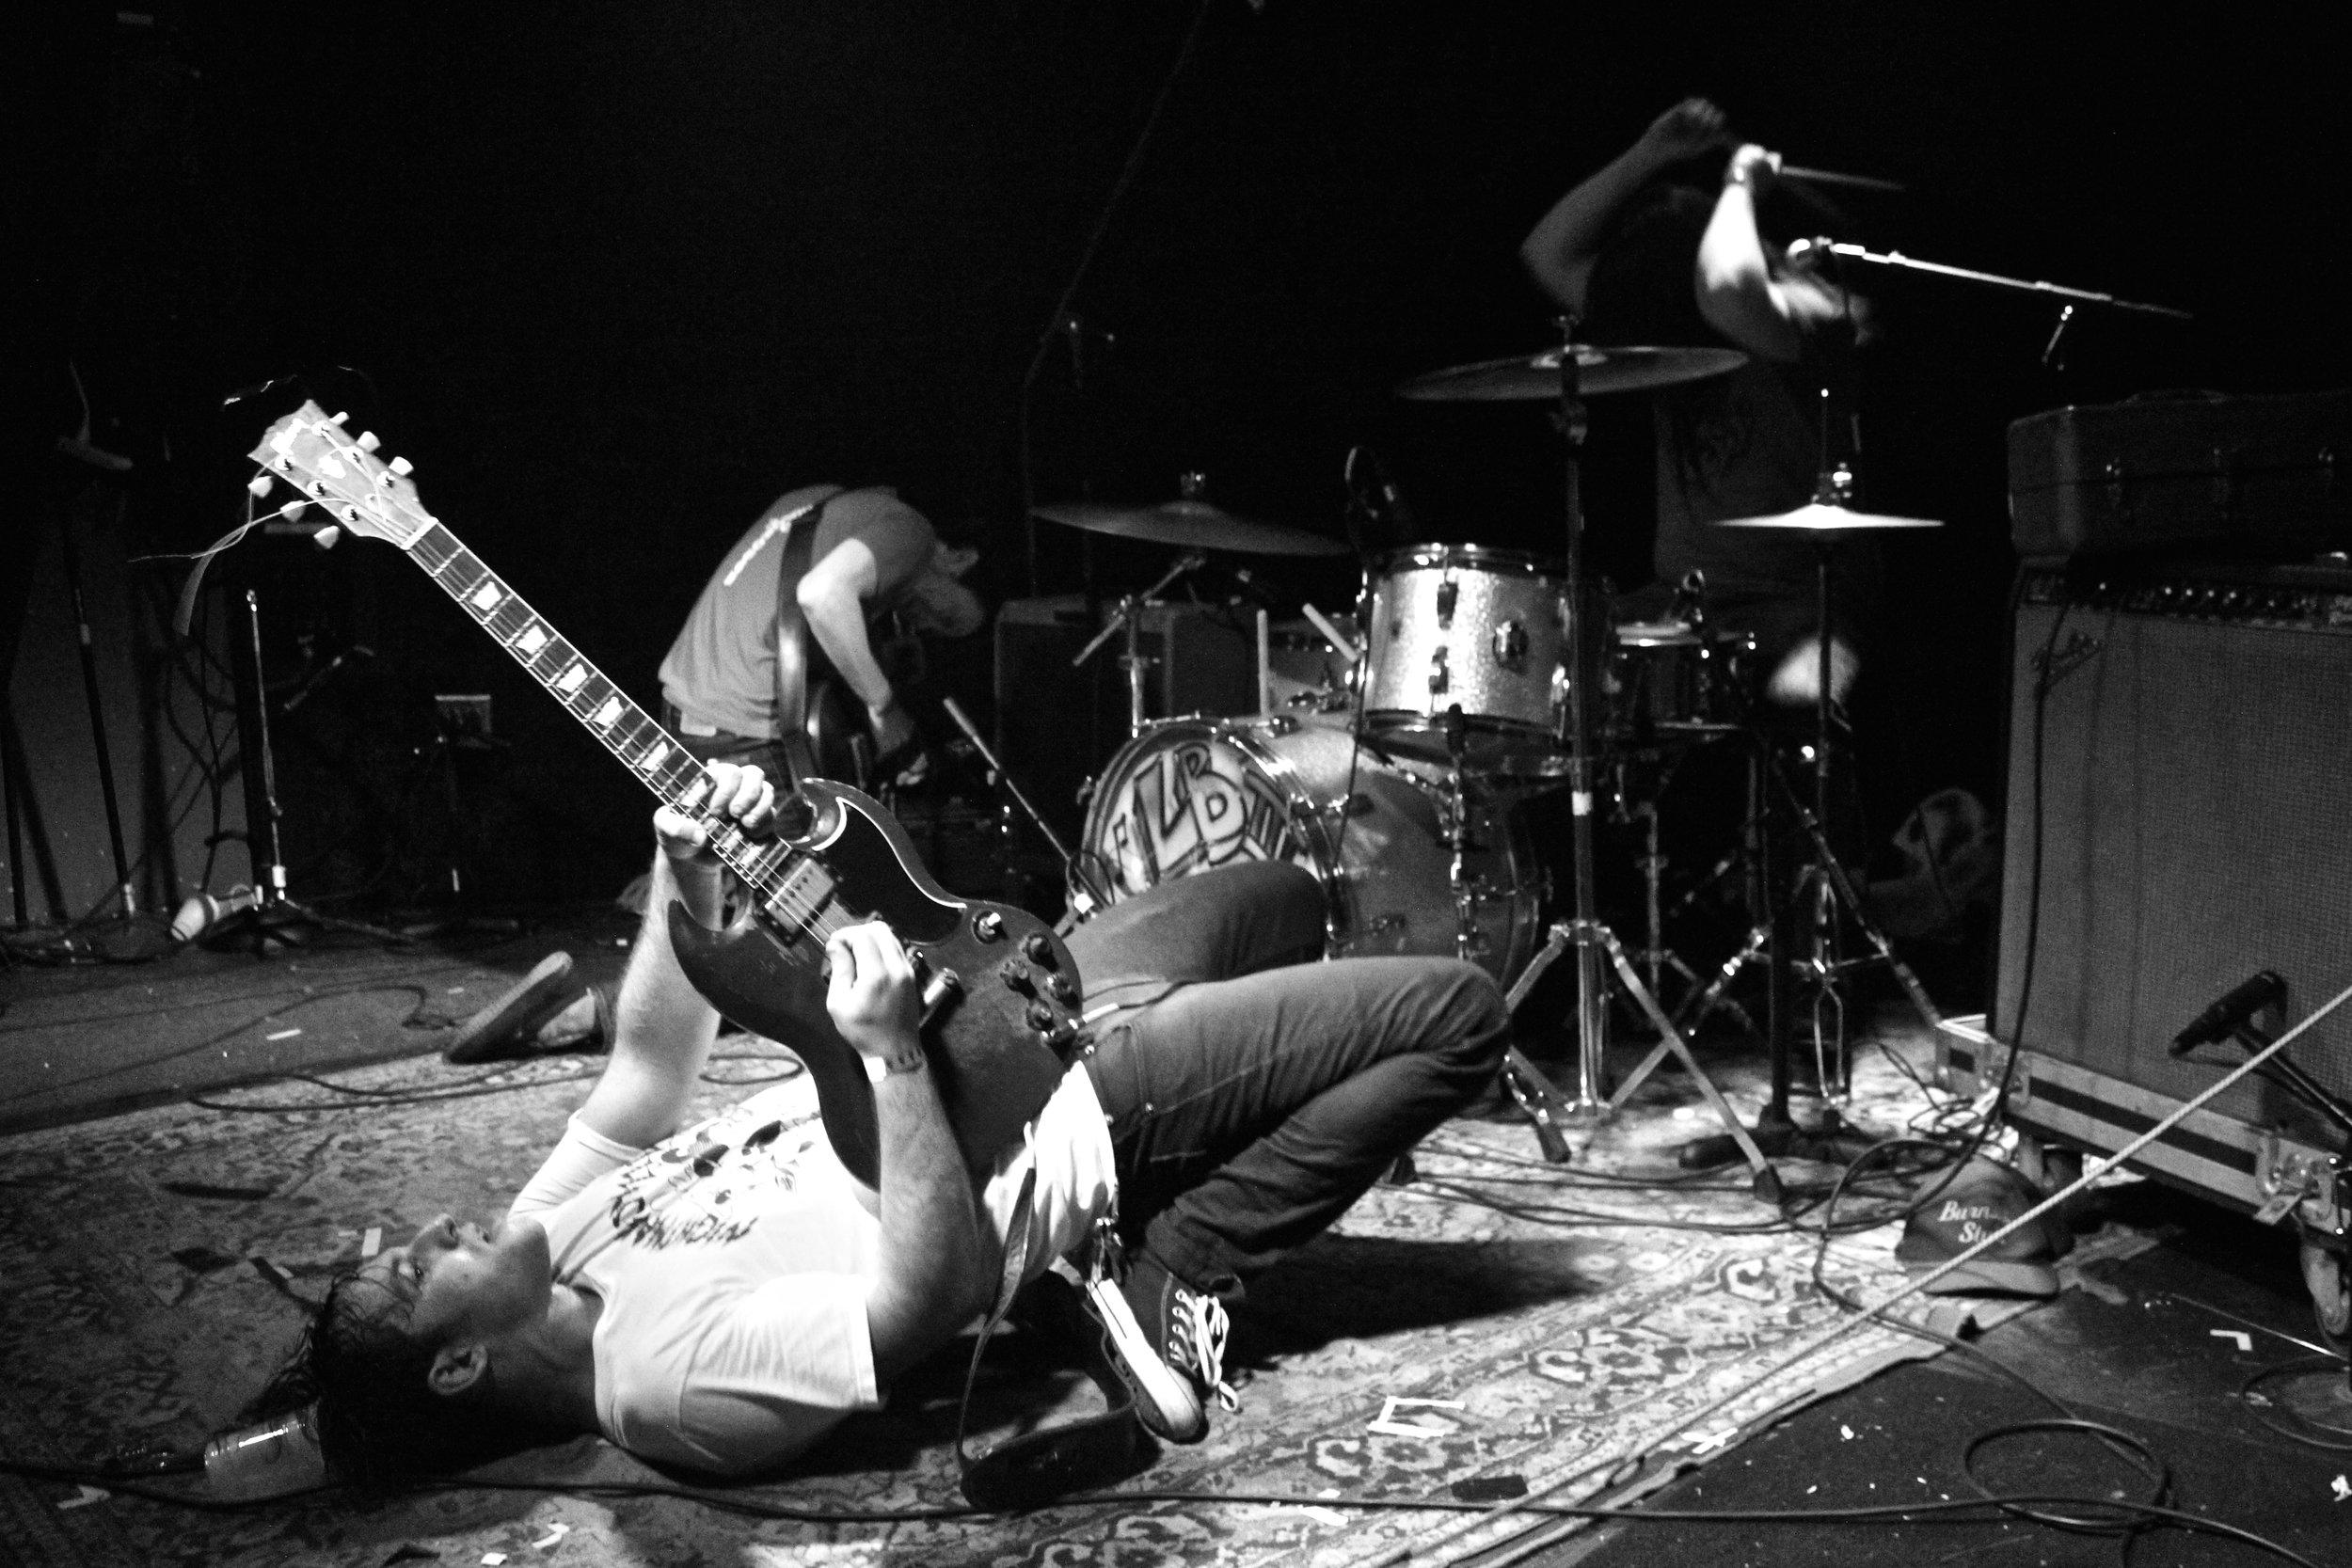 Lee Bains III & the Glory Fires. The Earl, Atlanta, GA. 2014.